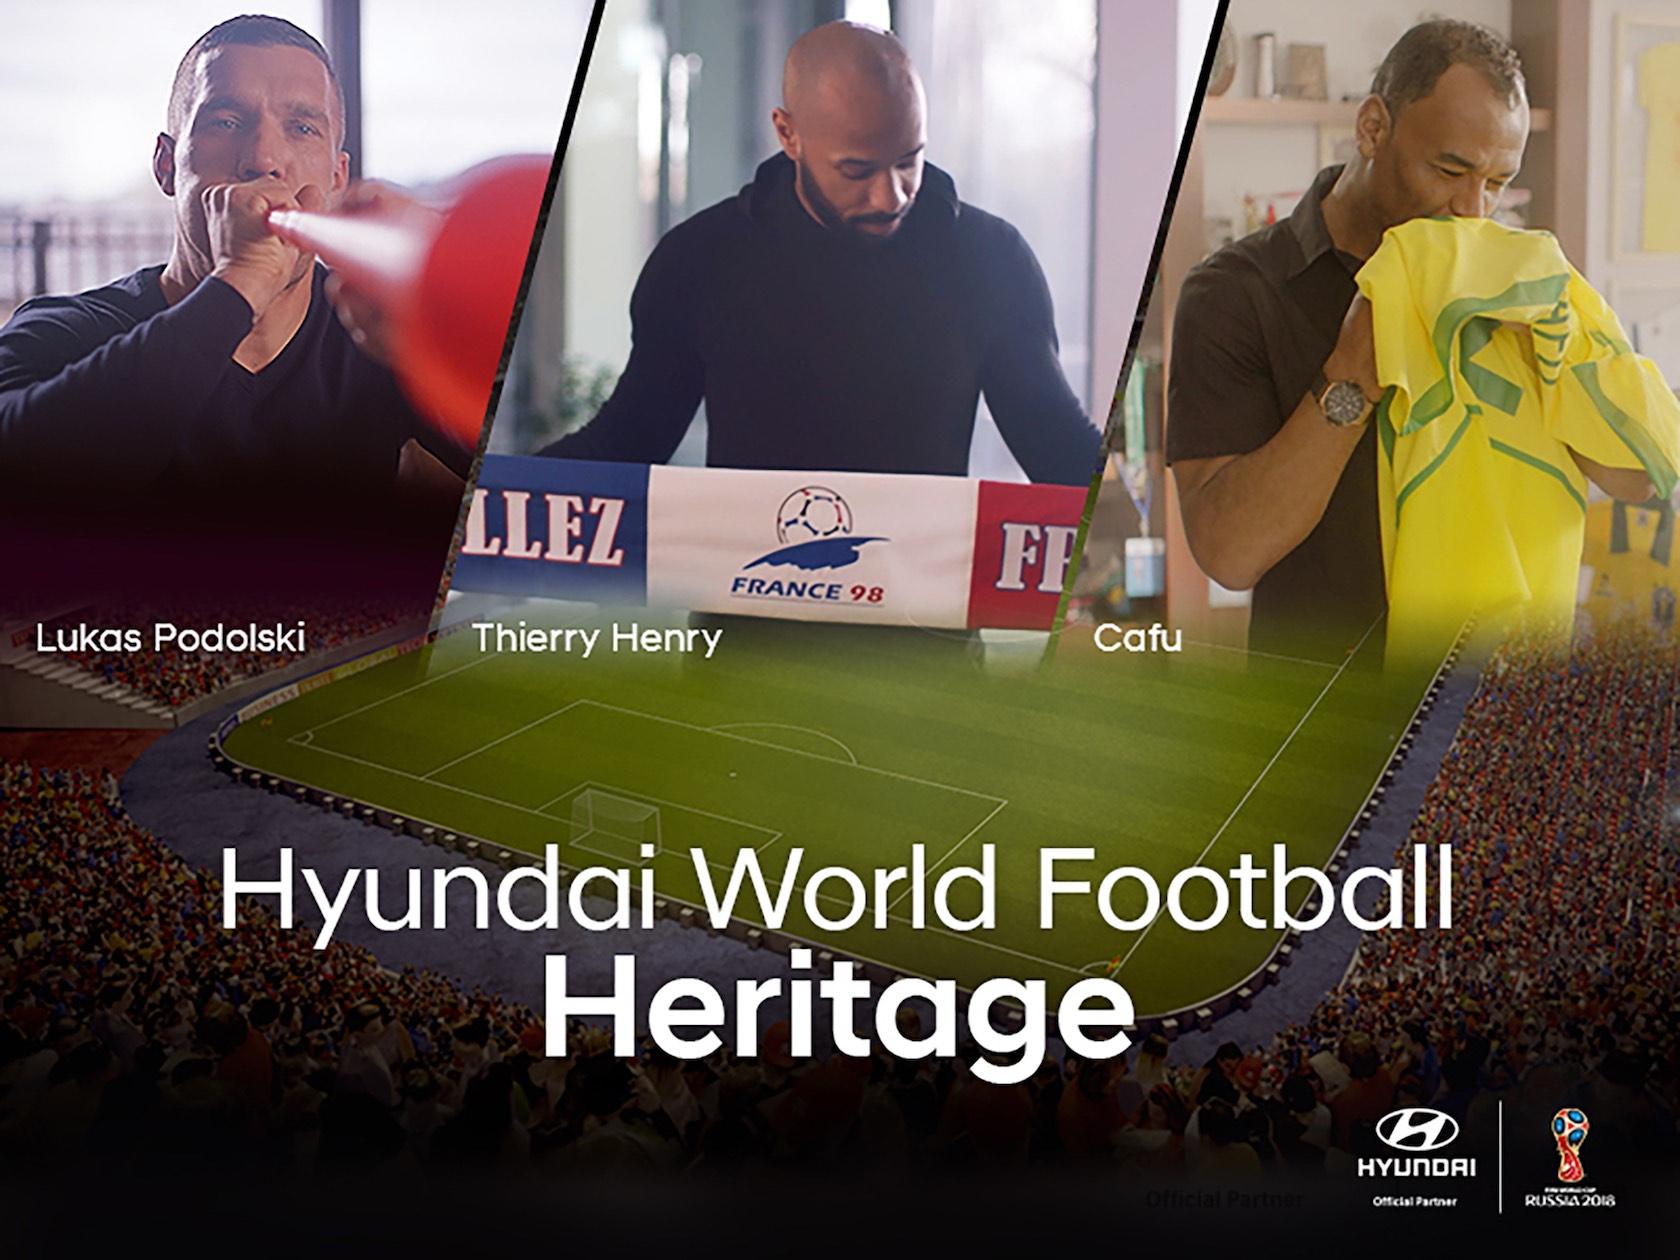 Hyundai World Football Heritage